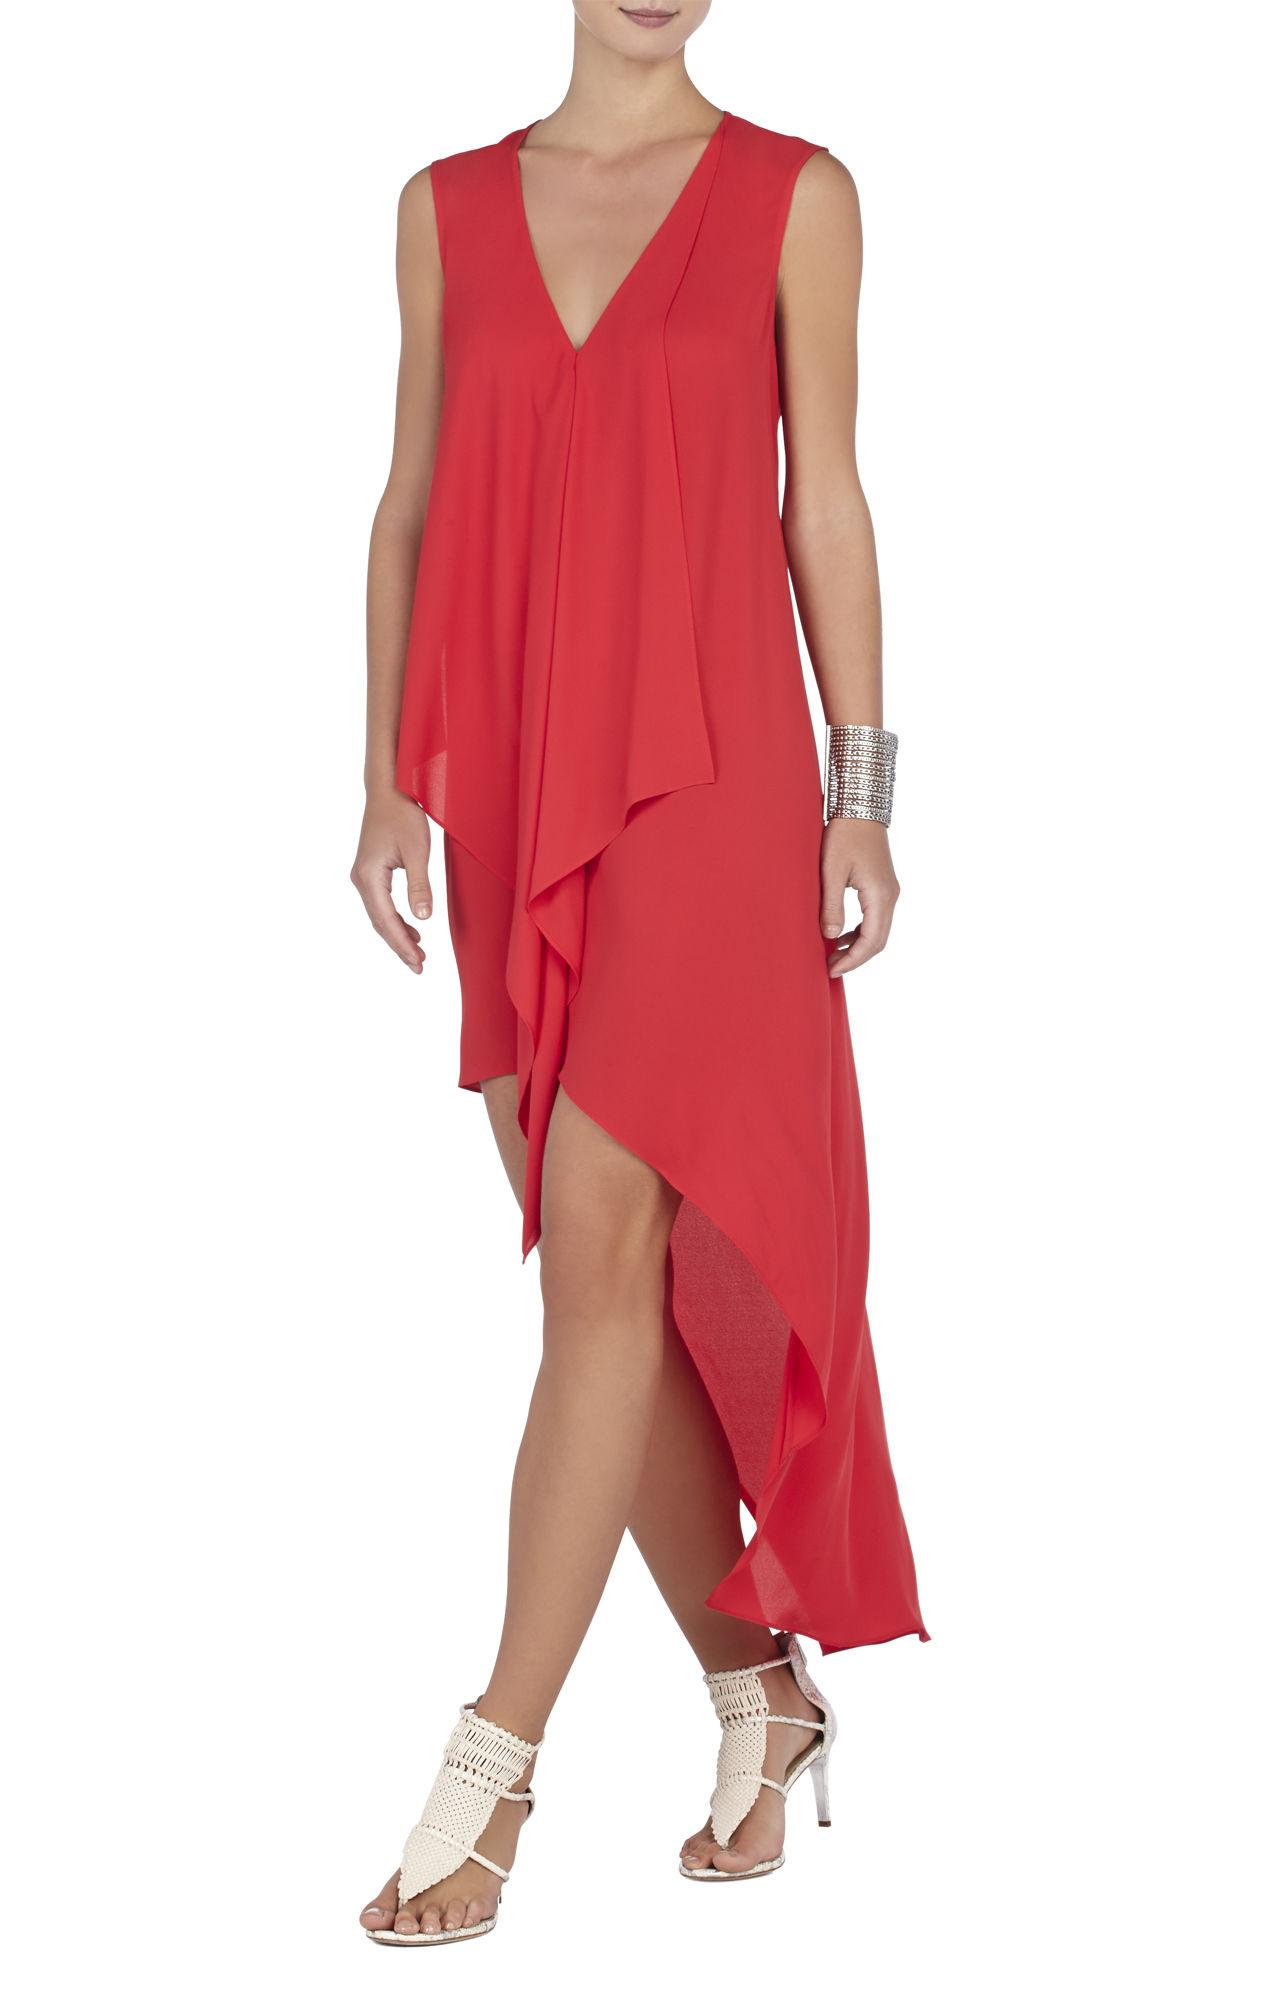 BCBG Red Evening Gown Ruffles Cascade – Dresses for Woman